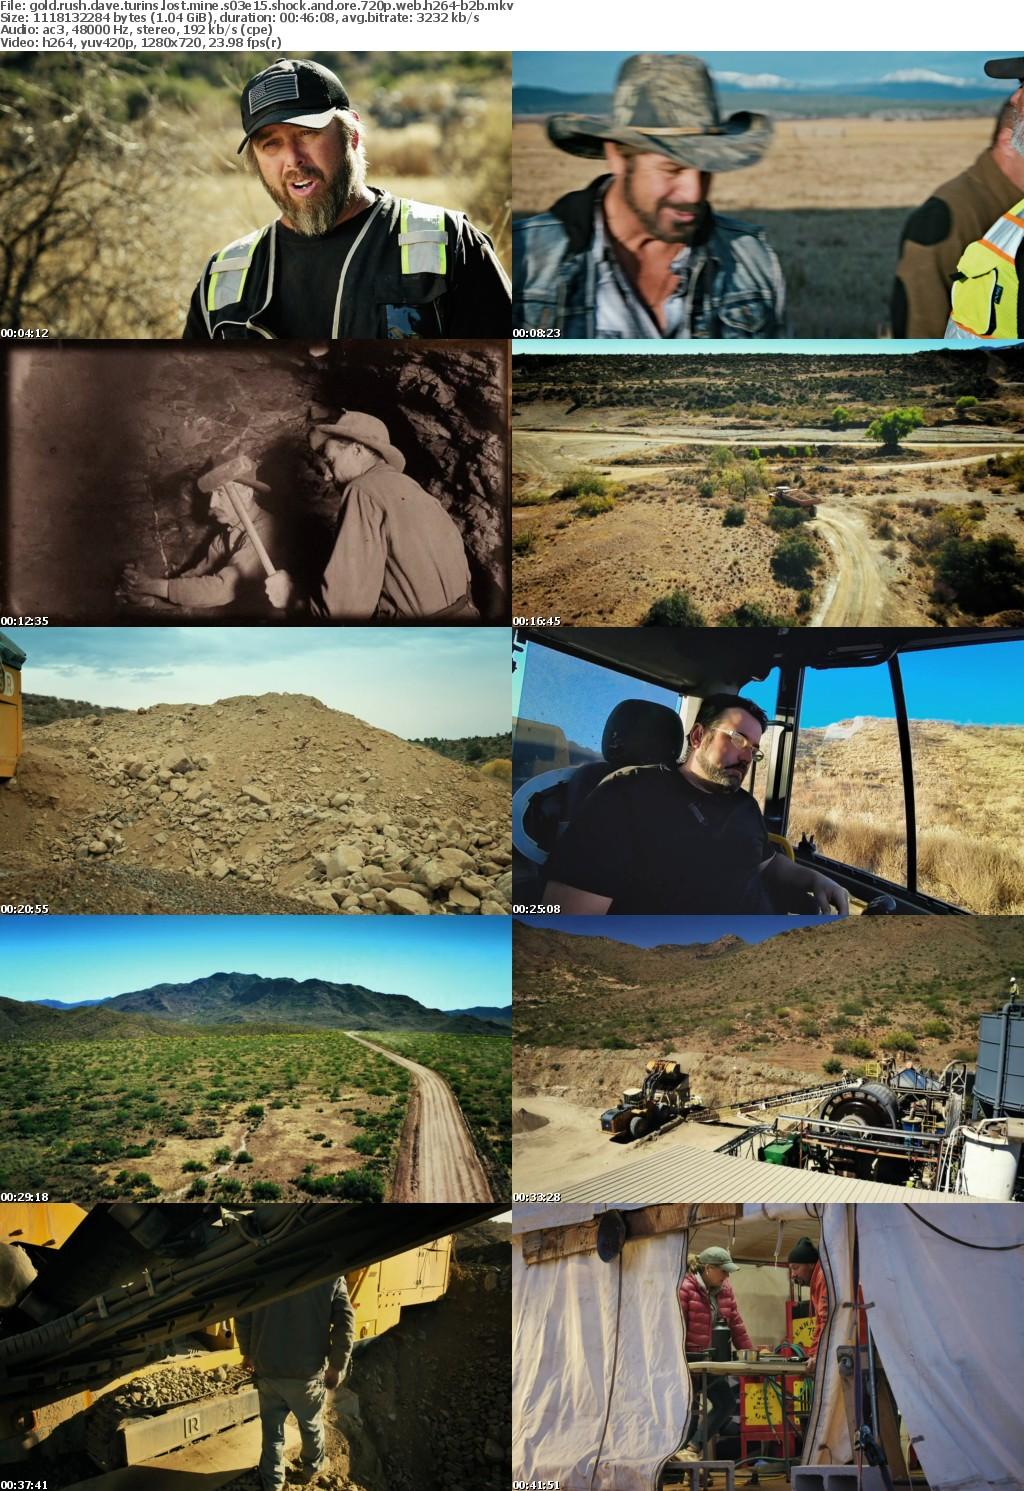 Gold Rush Dave Turins Lost Mine S03E15 Shock and Ore 720p WEB h264-B2B